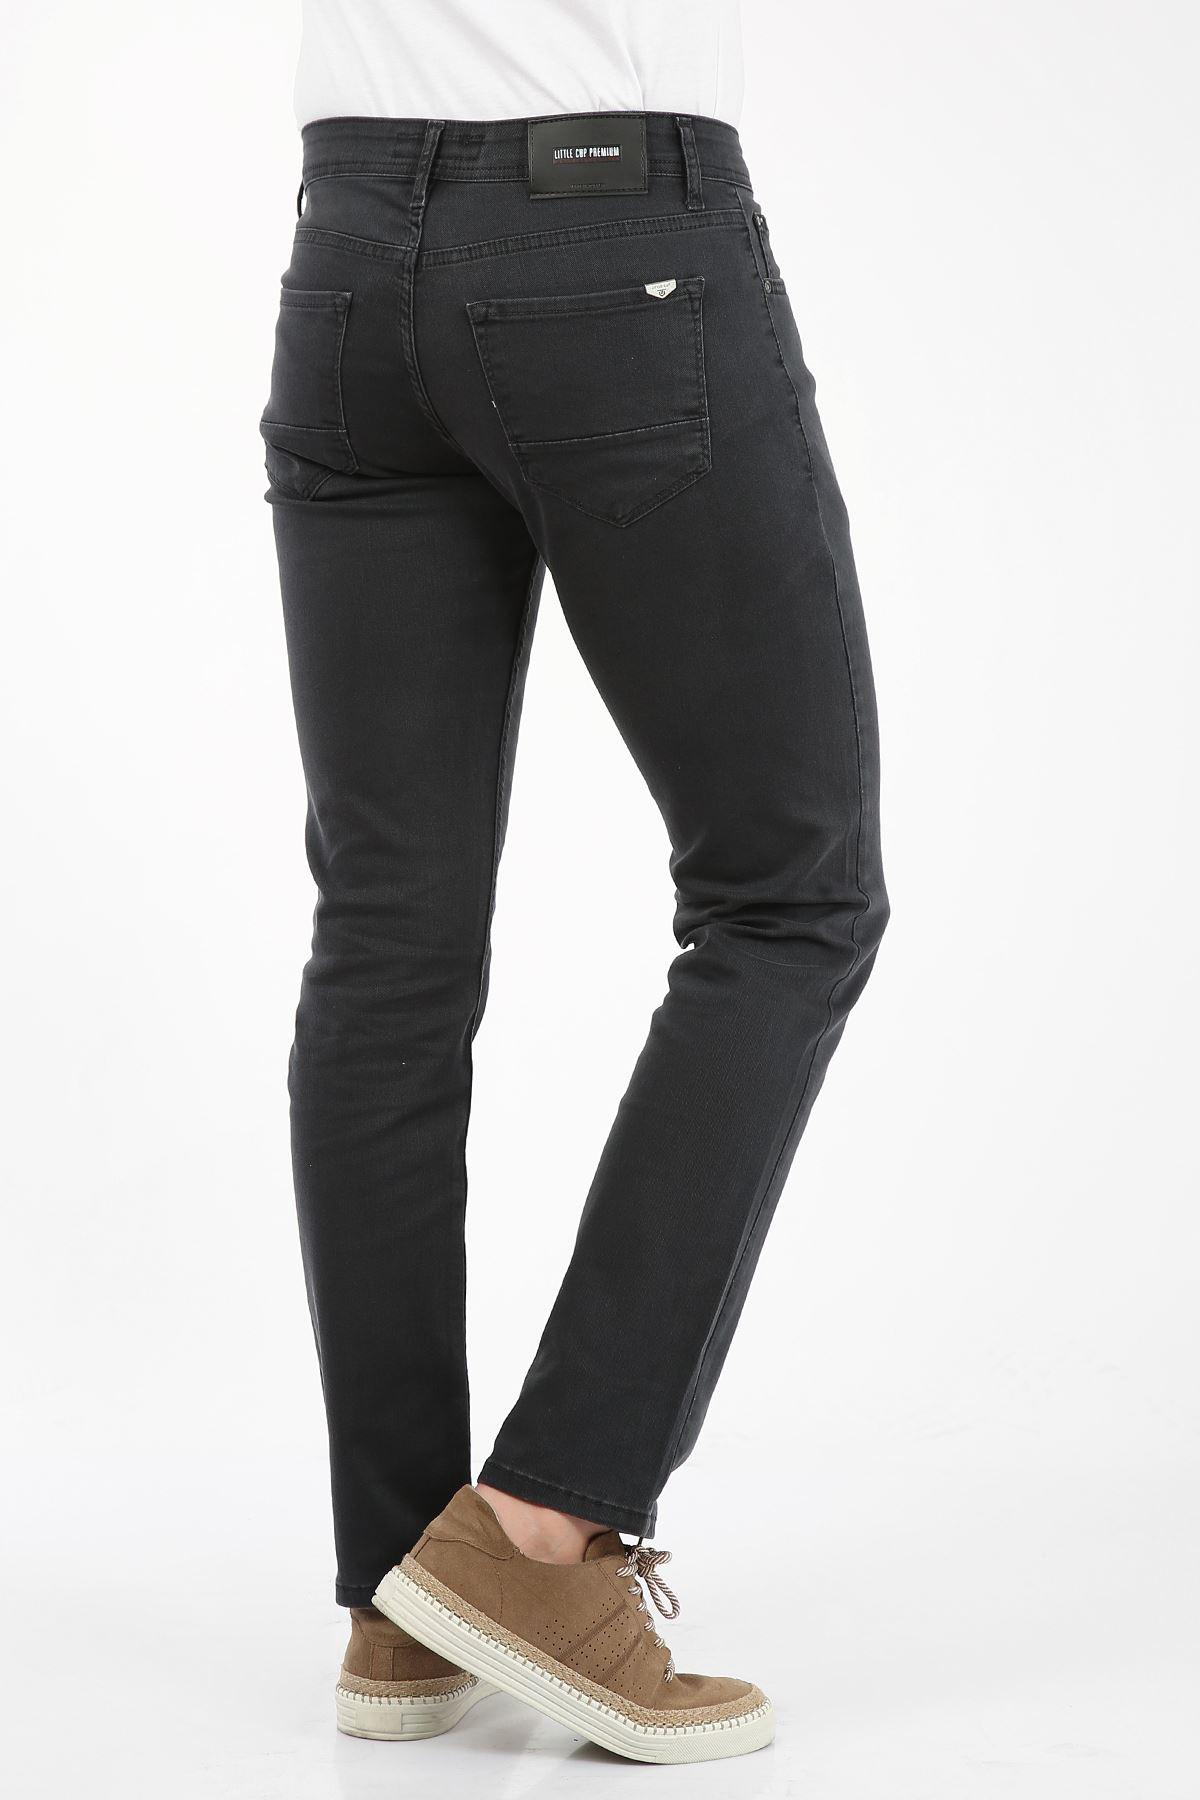 Antrasit Regular Fit Fermuarlı Erkek Jeans Pantolon-FARADAY